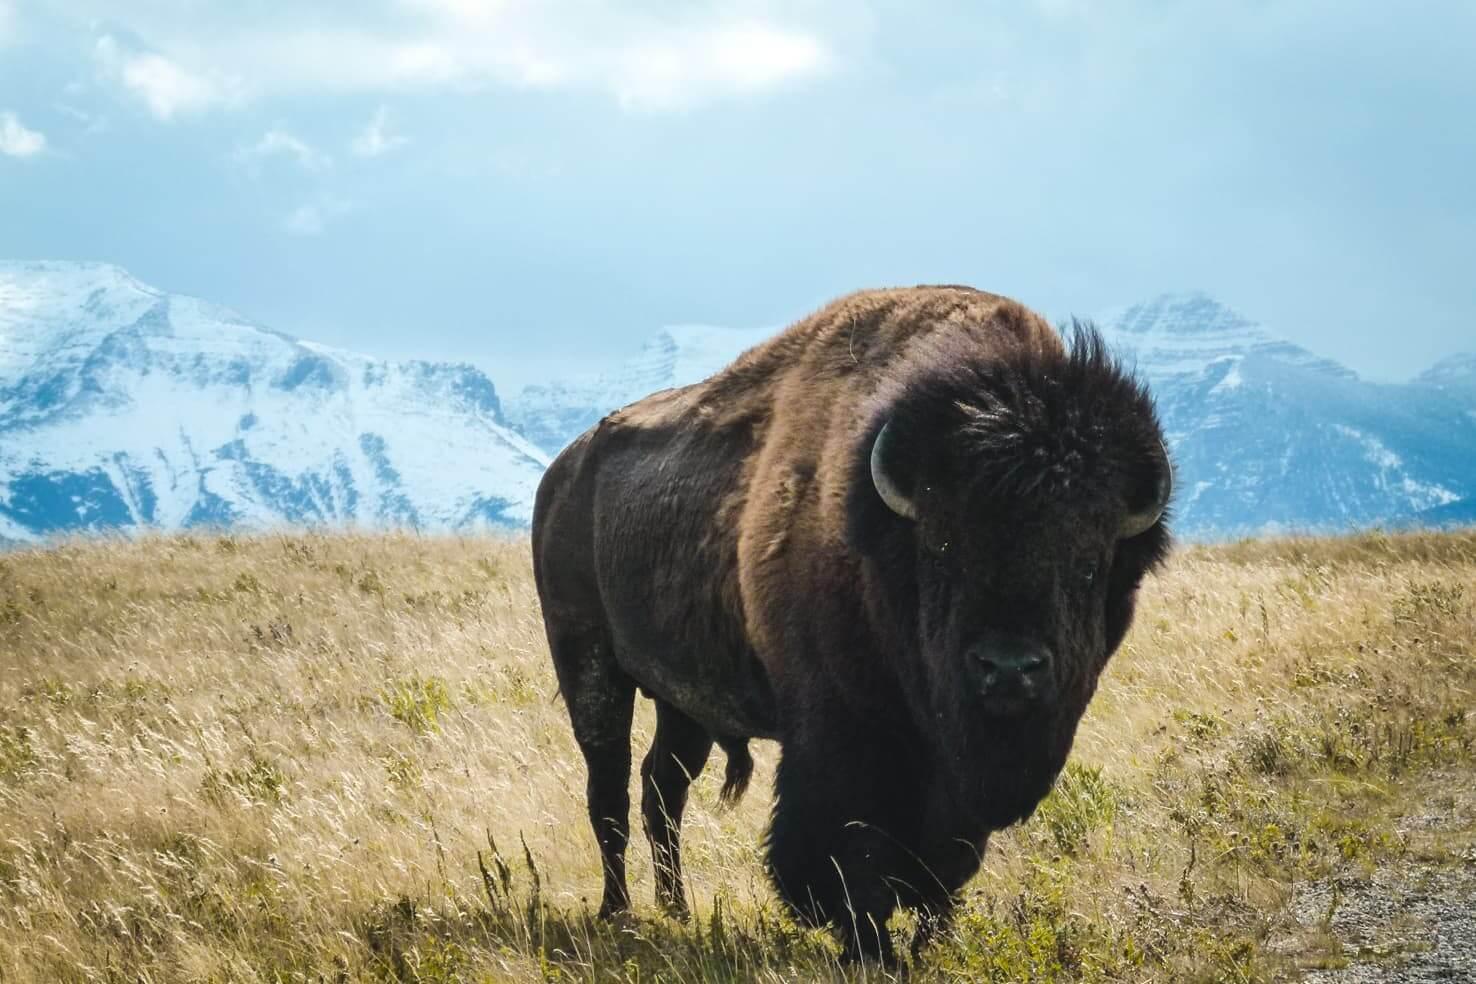 Canadian Rockies road trip itinerary - Bison Paddock Loop near Waterton Lakes National Park